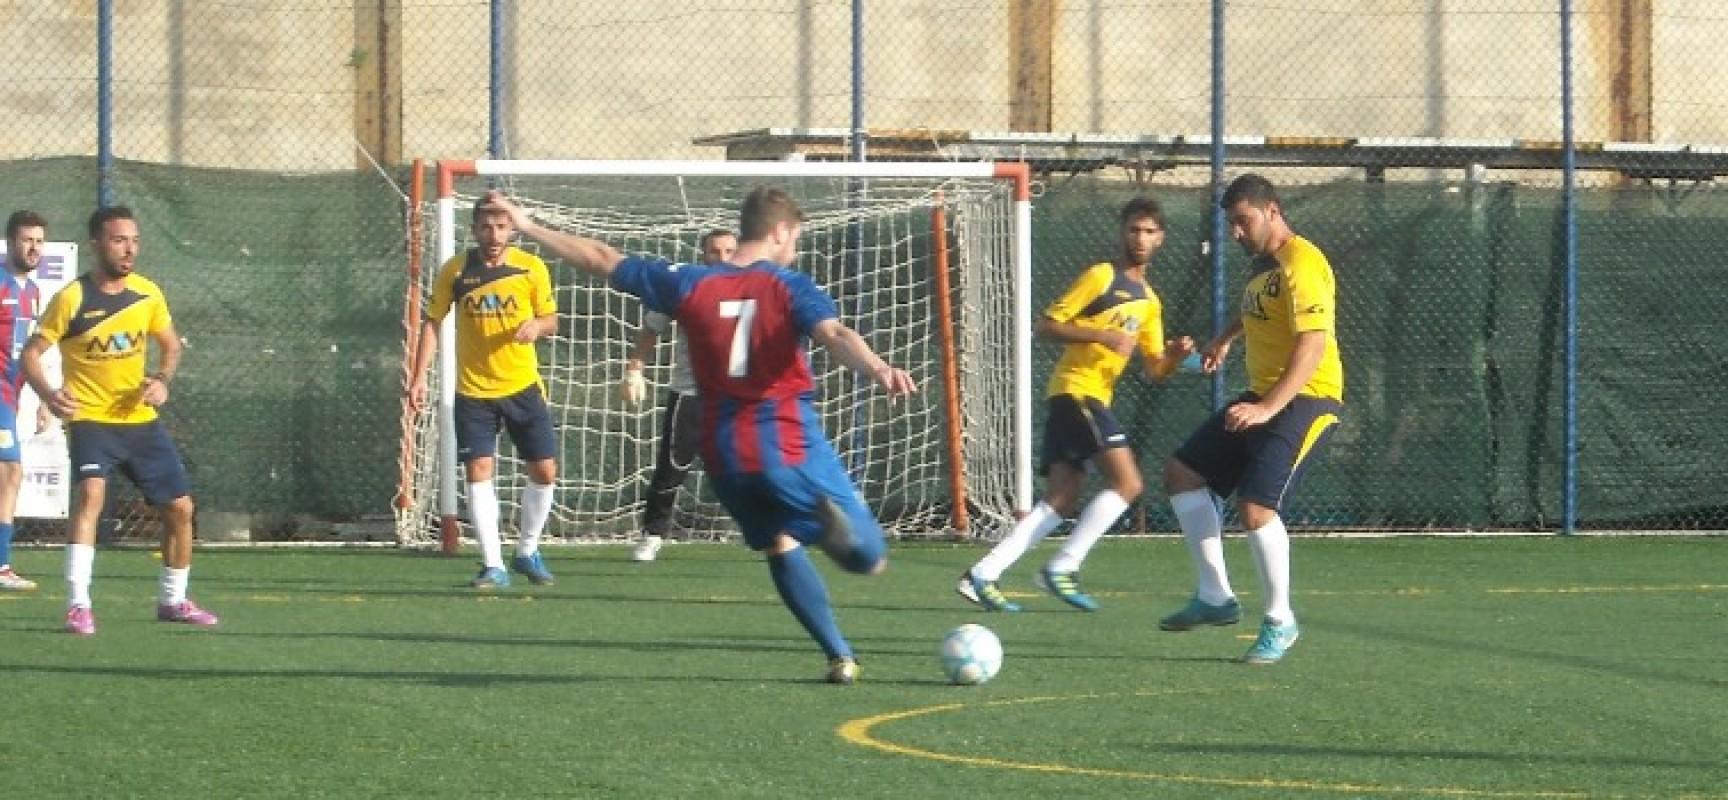 Santos Club ancora una rimonta super, da 0-4 a 6-4!